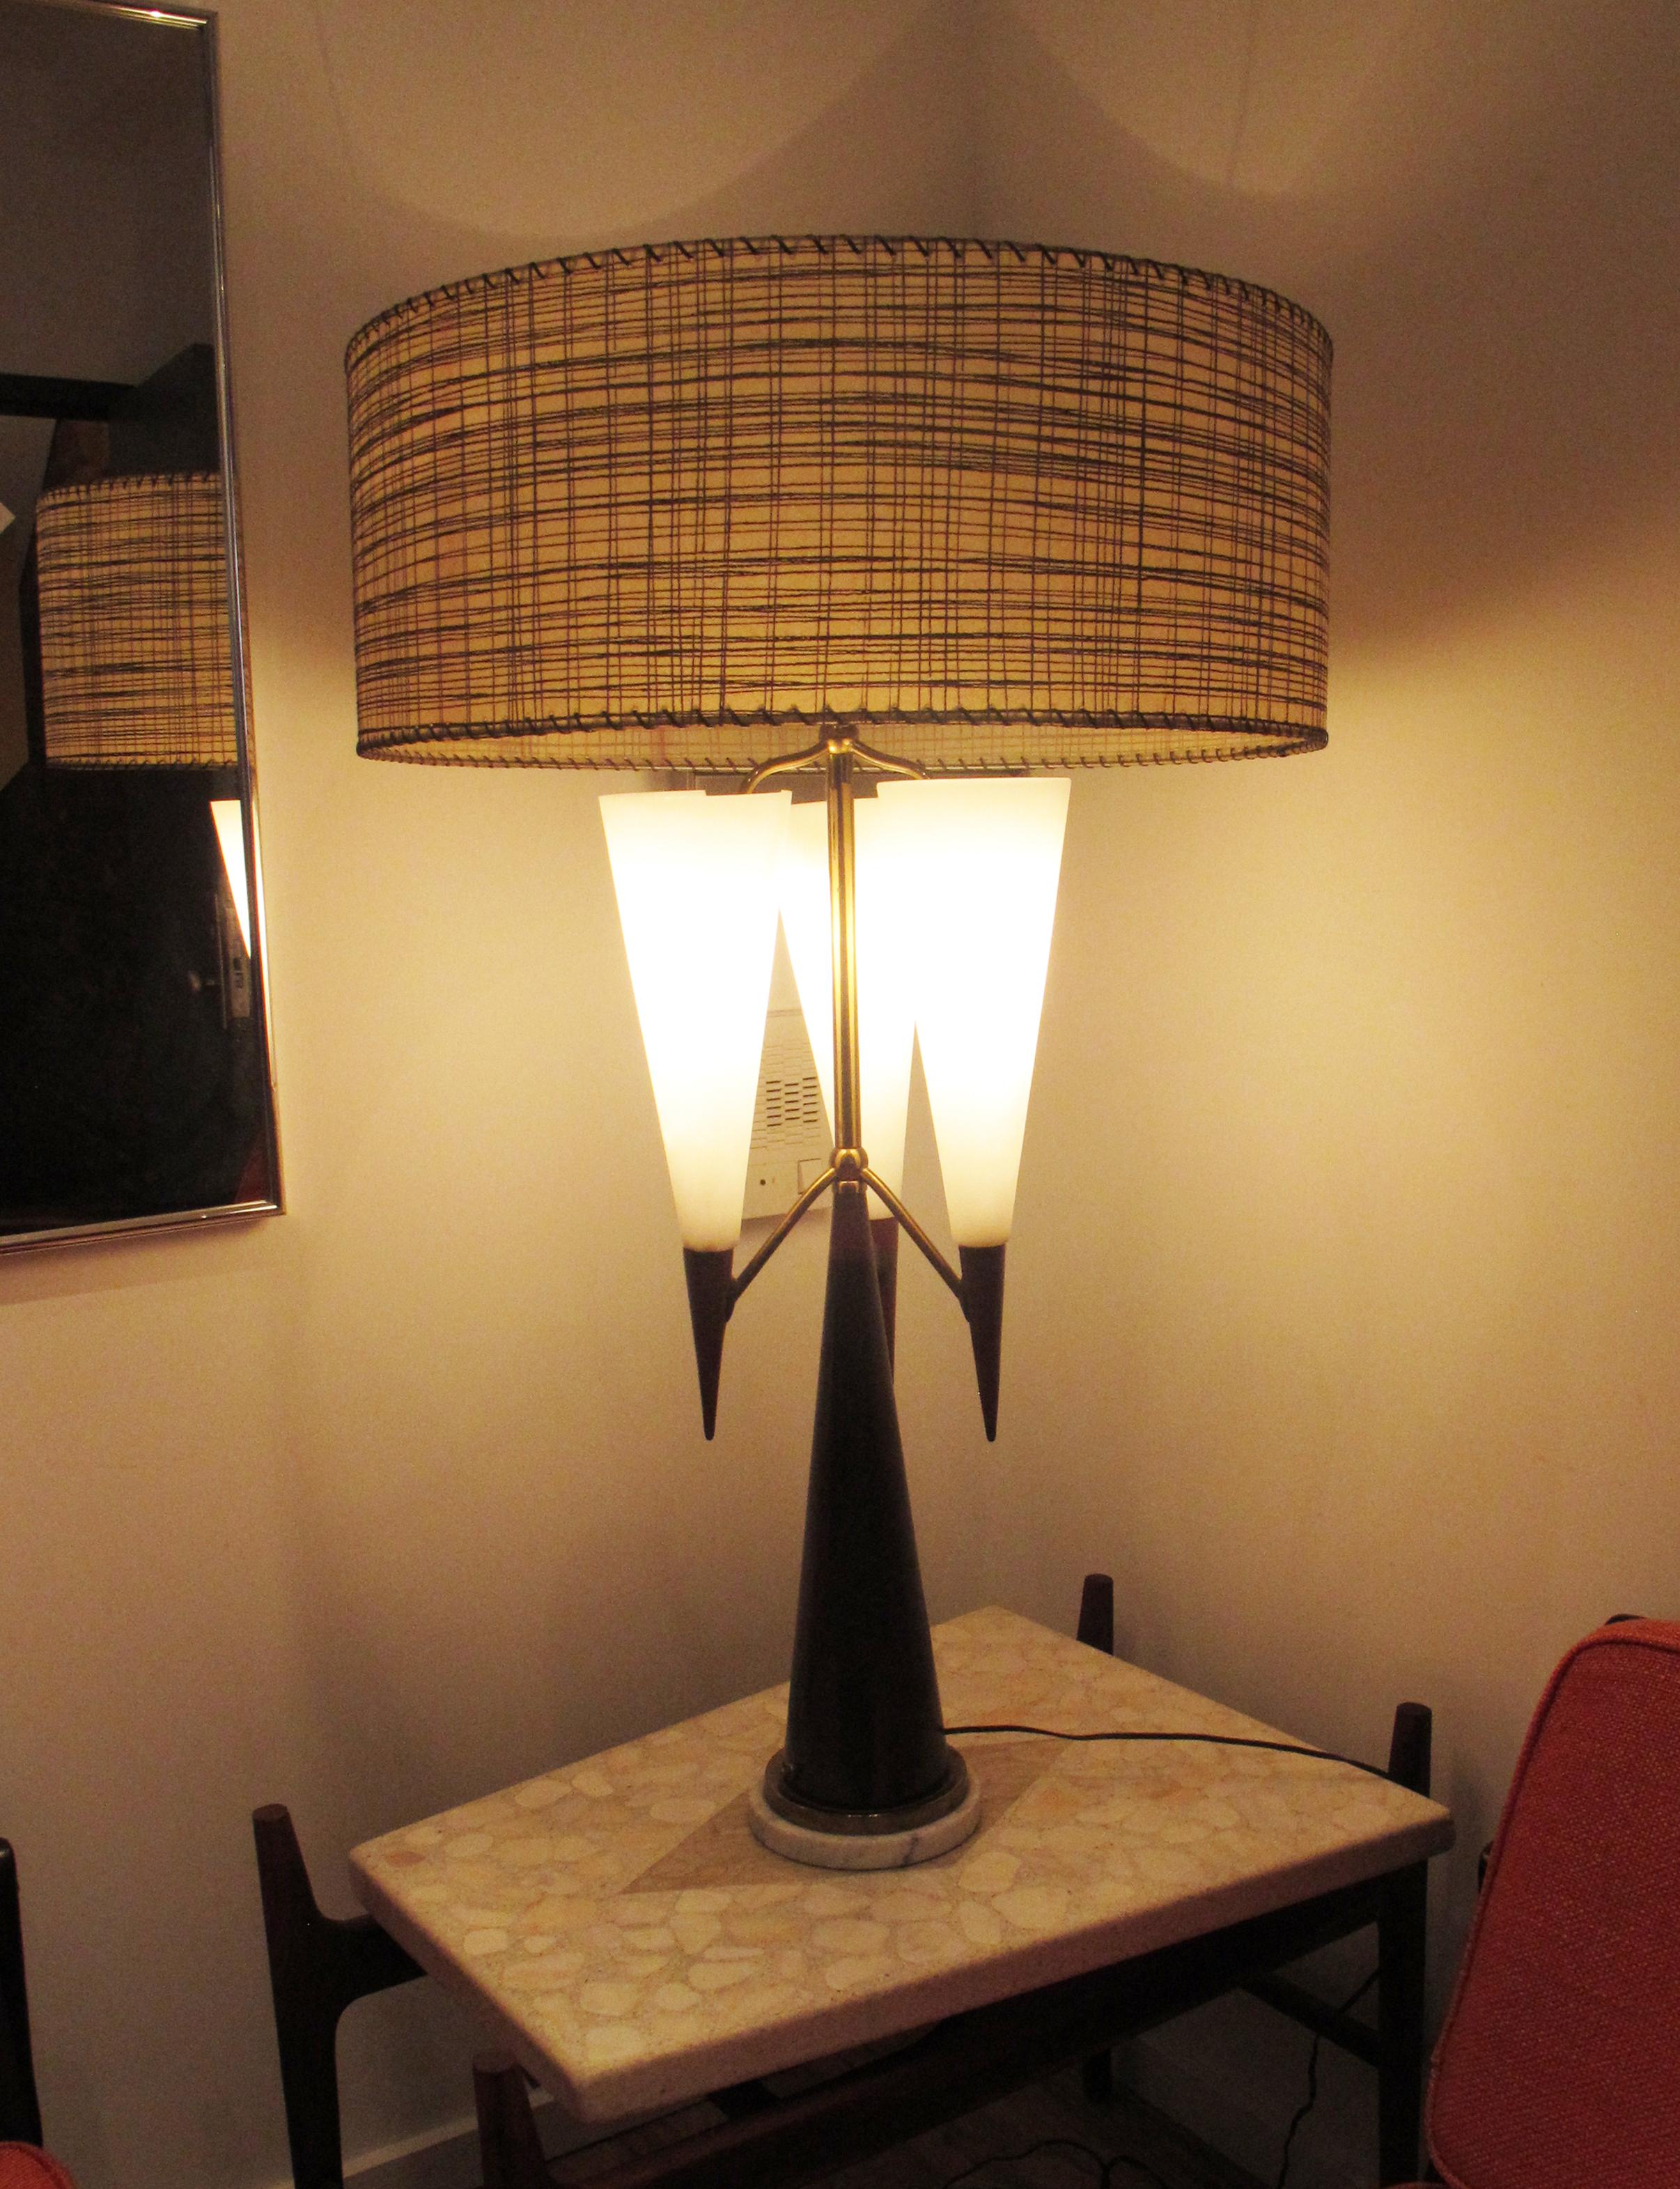 GRAND MID CENTURY PONTI STYLE TABLE LAMP